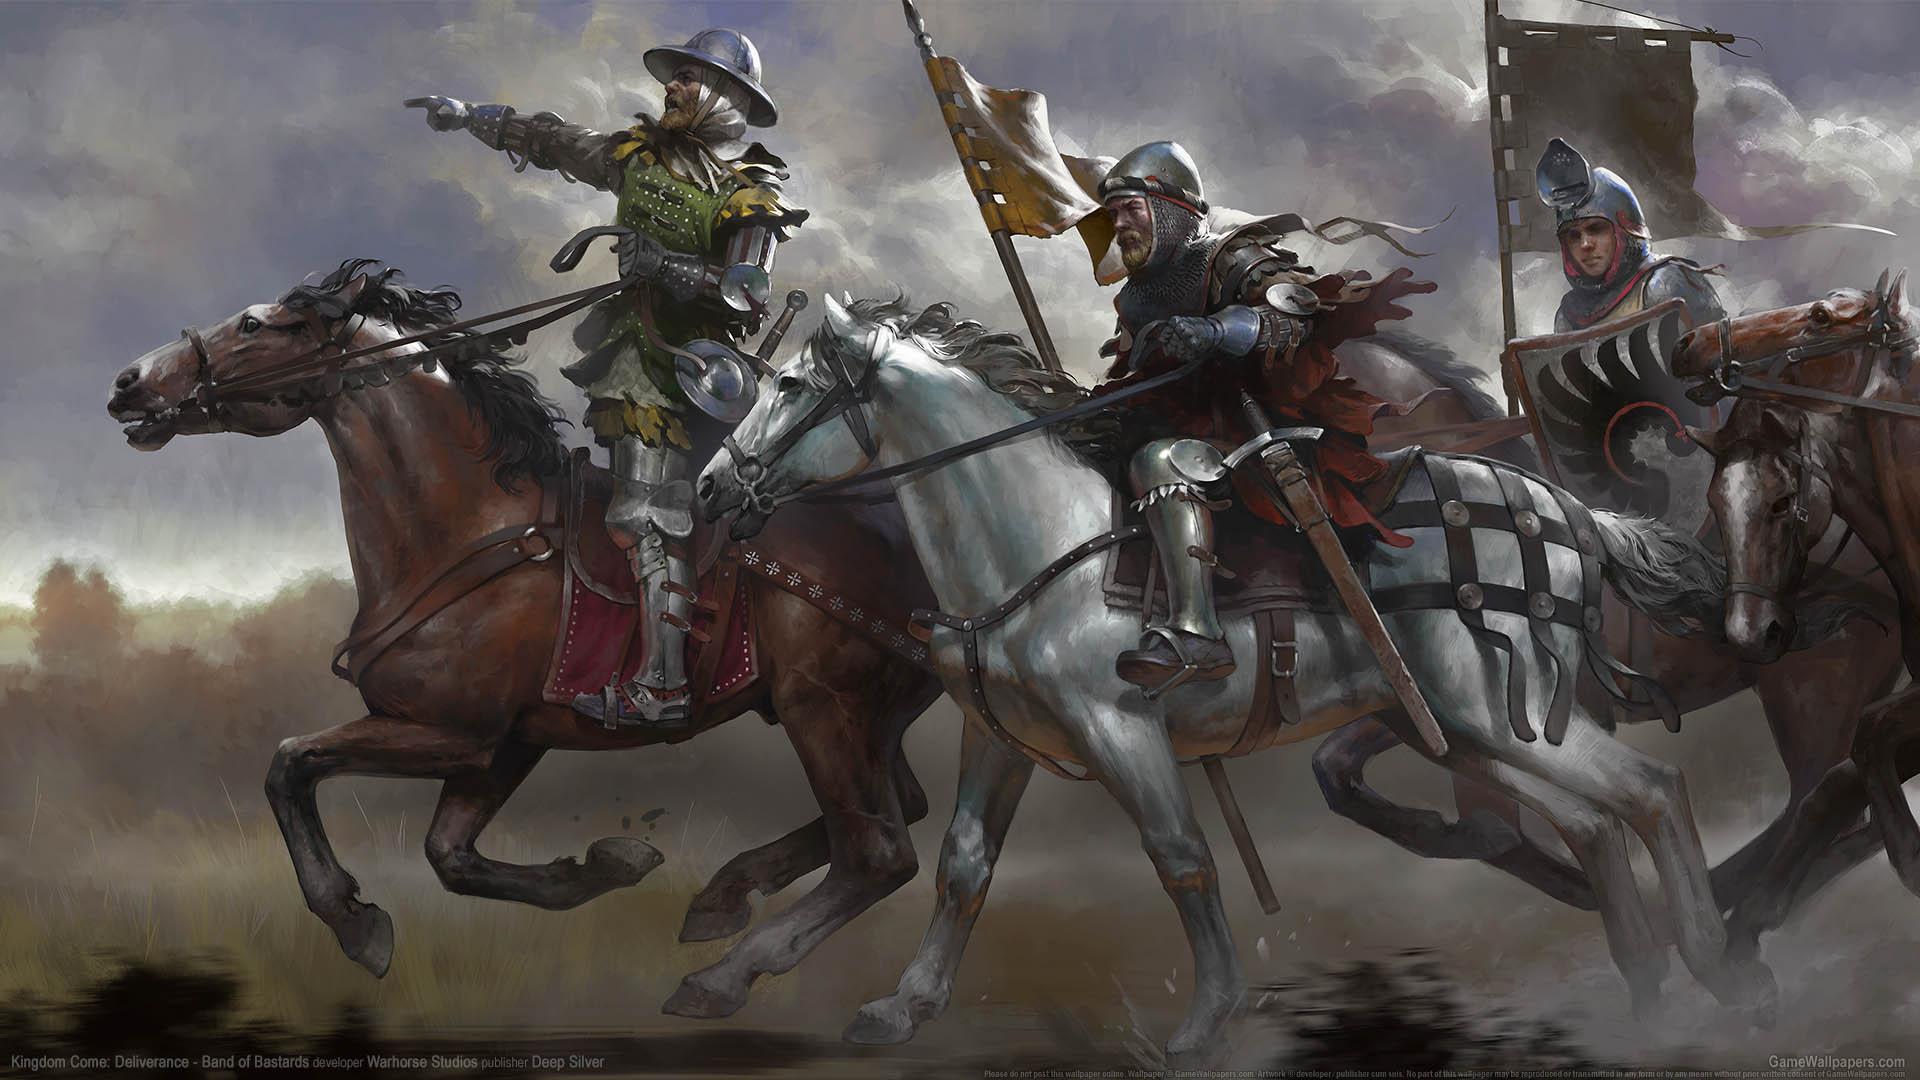 Kingdom Come Deliverance   Band of Bastards wallpaper 02 1920x1080 1920x1080